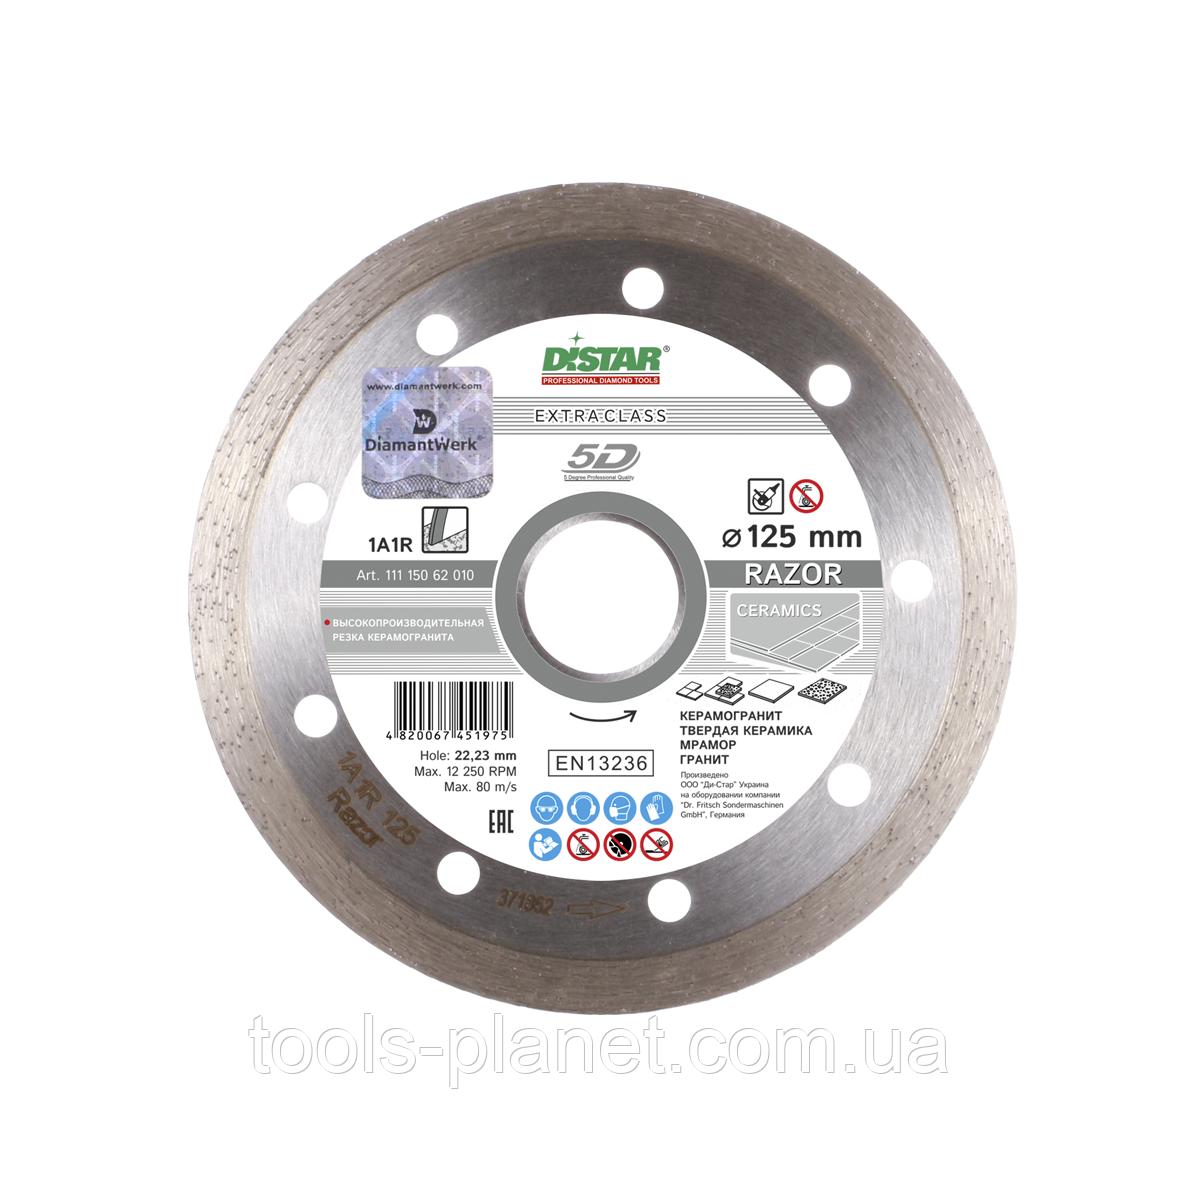 Алмазный диск Distar 1A1R 125 x 1,6 x 10 x 22,23 Razor 5D (11115062010)